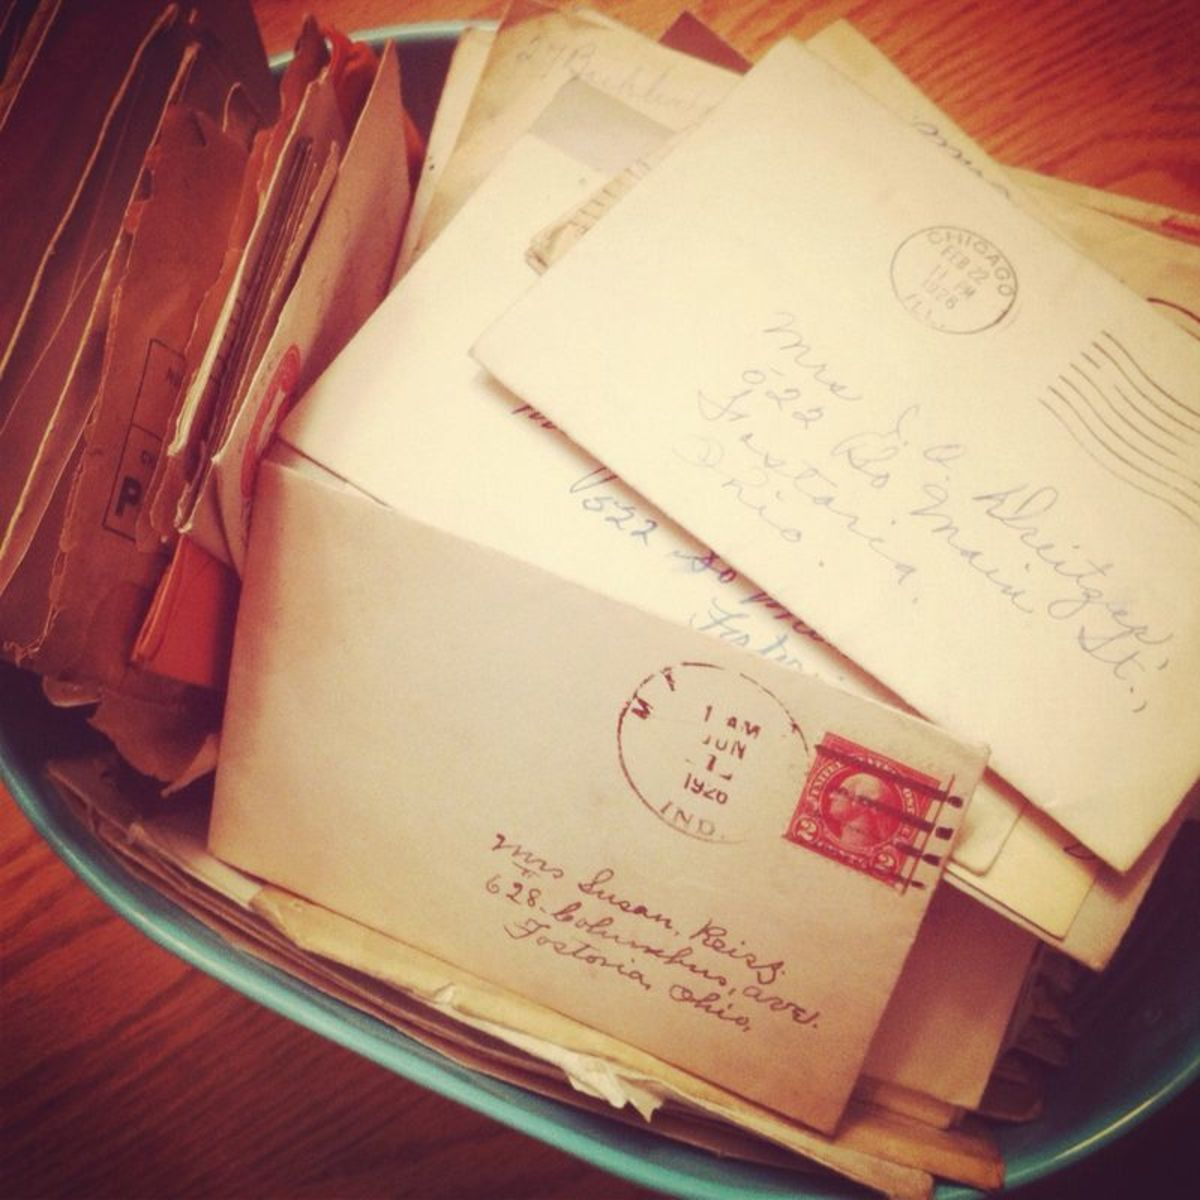 Where Do Unanswered Love Letters Go?